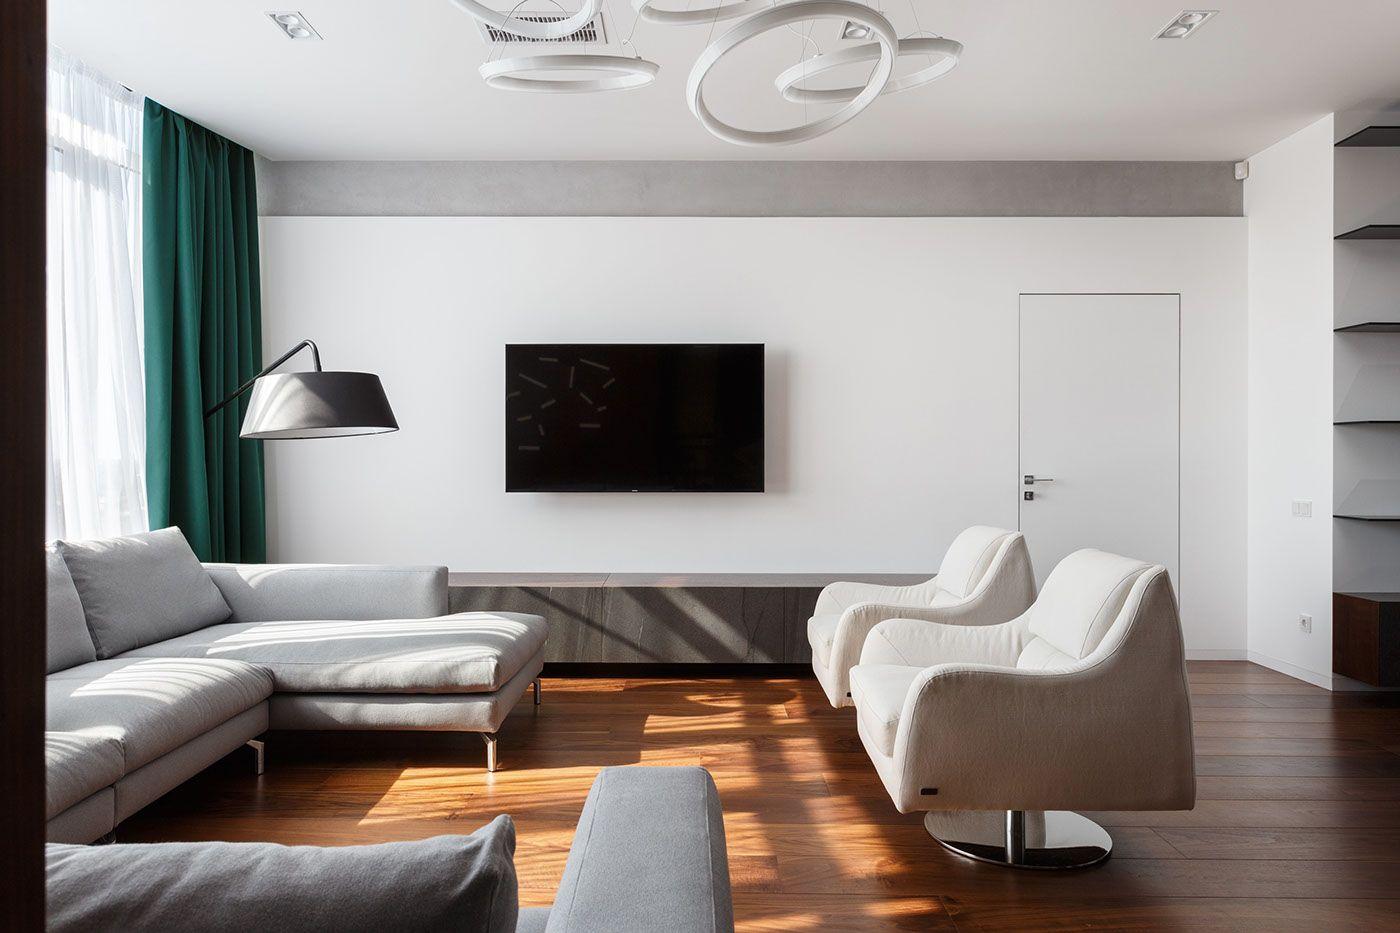 https://www.behance.net/gallery/51883941/Over-O-apartment-by-SVOYA ...